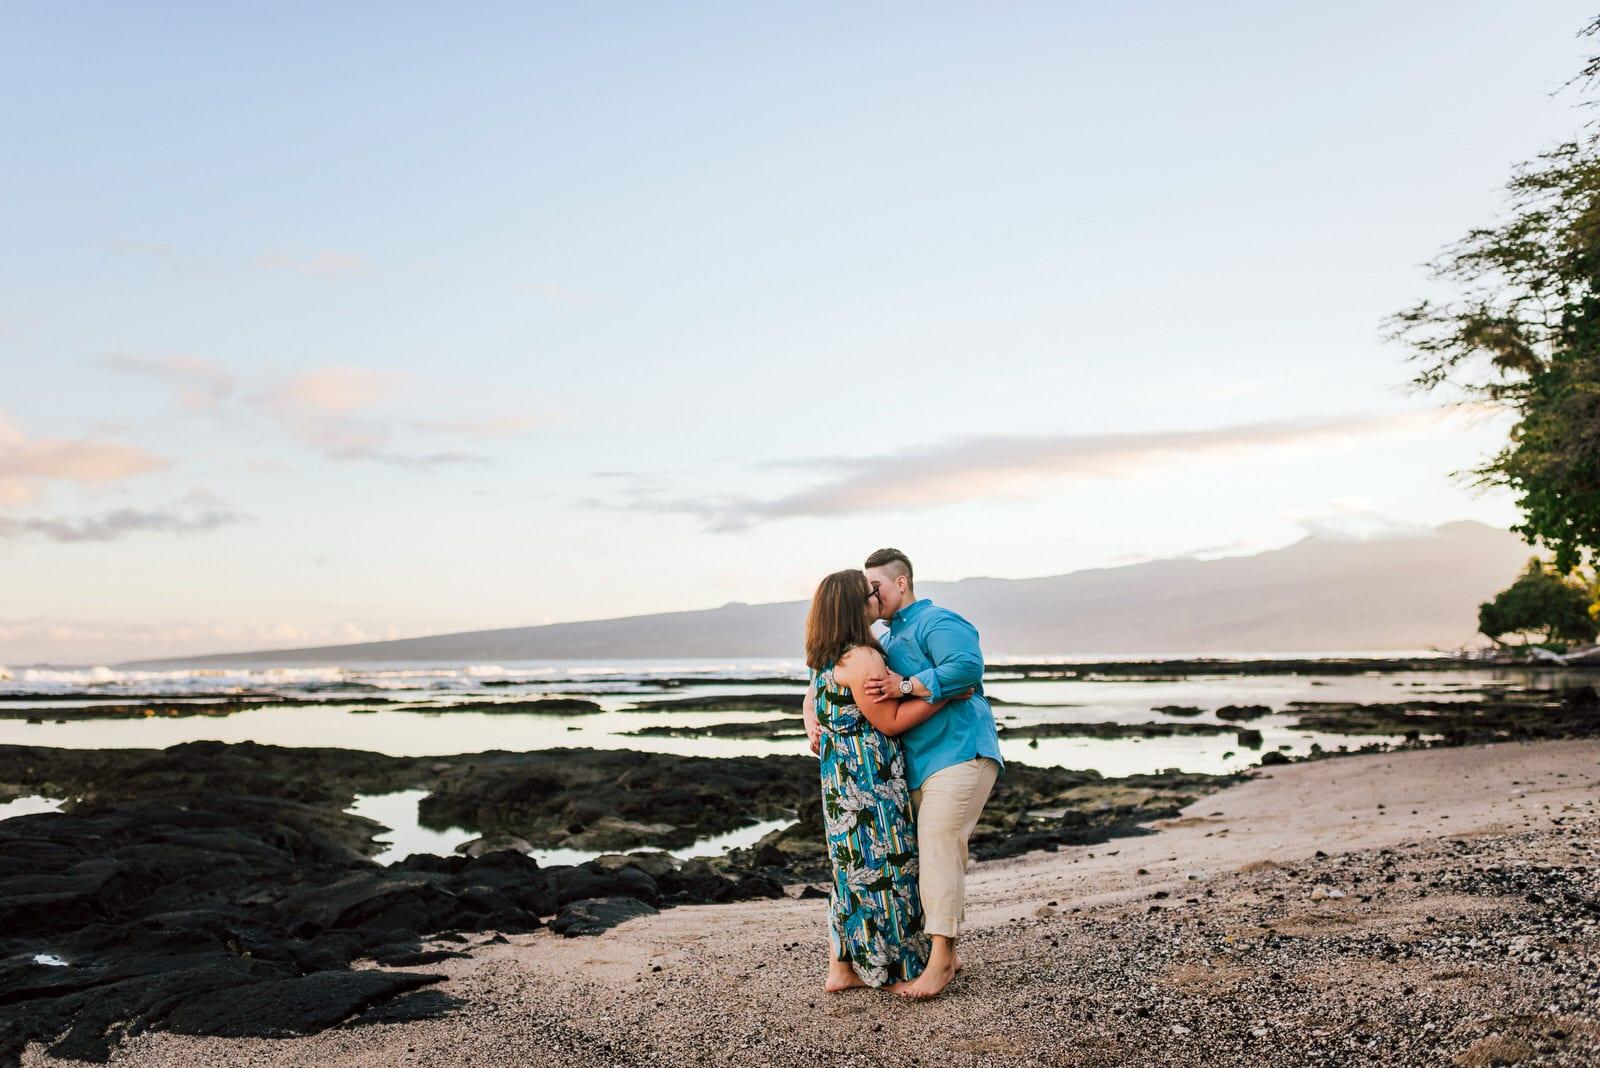 hawaii-photographer-lgbt-sunrise-honeymoon-9.jpg